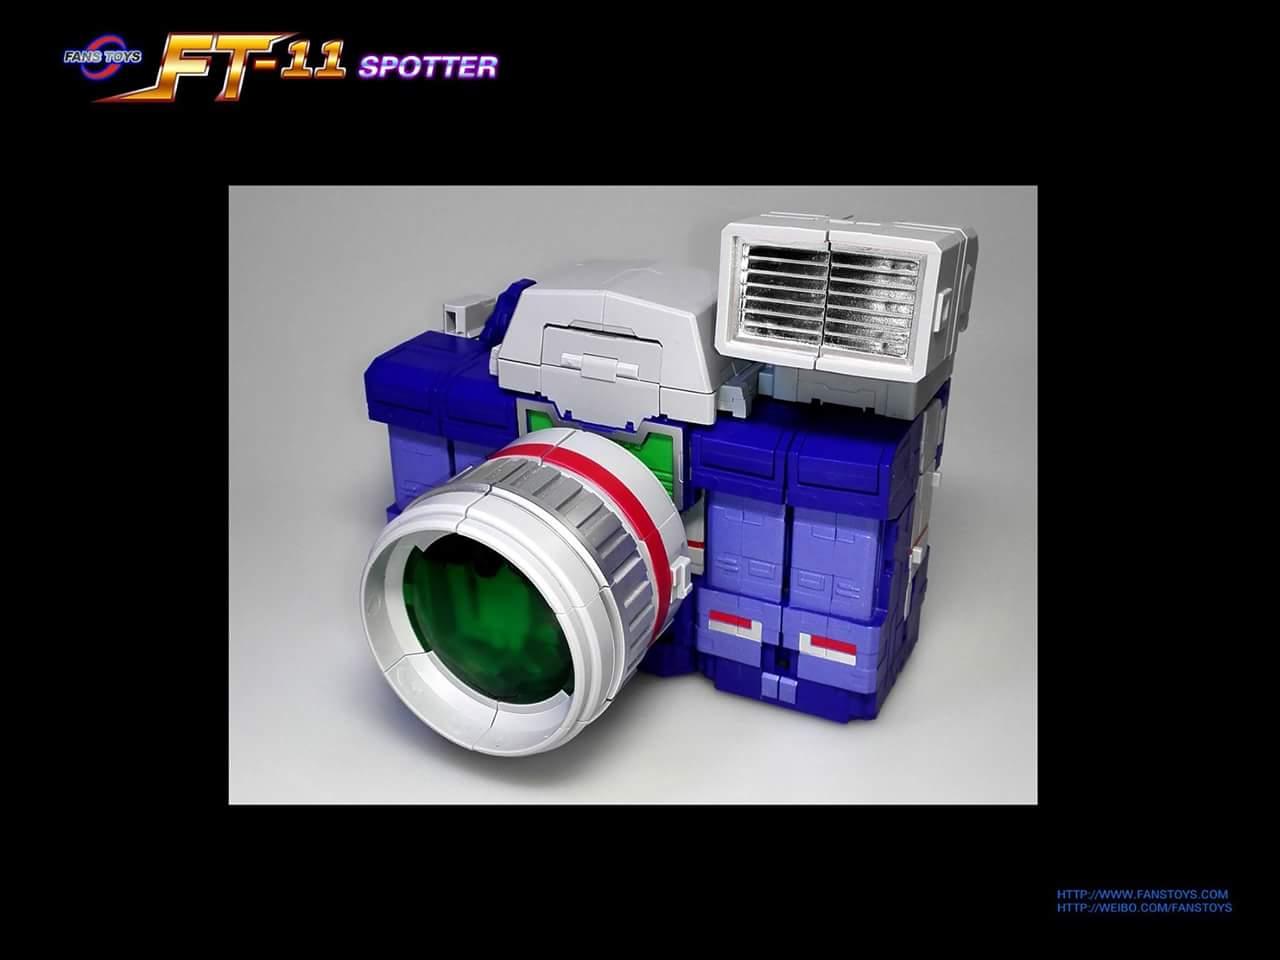 [Fanstoys] Produit Tiers - Jouet FT-11 Spotter - aka Reflector/Réflecteur MD1iulnA